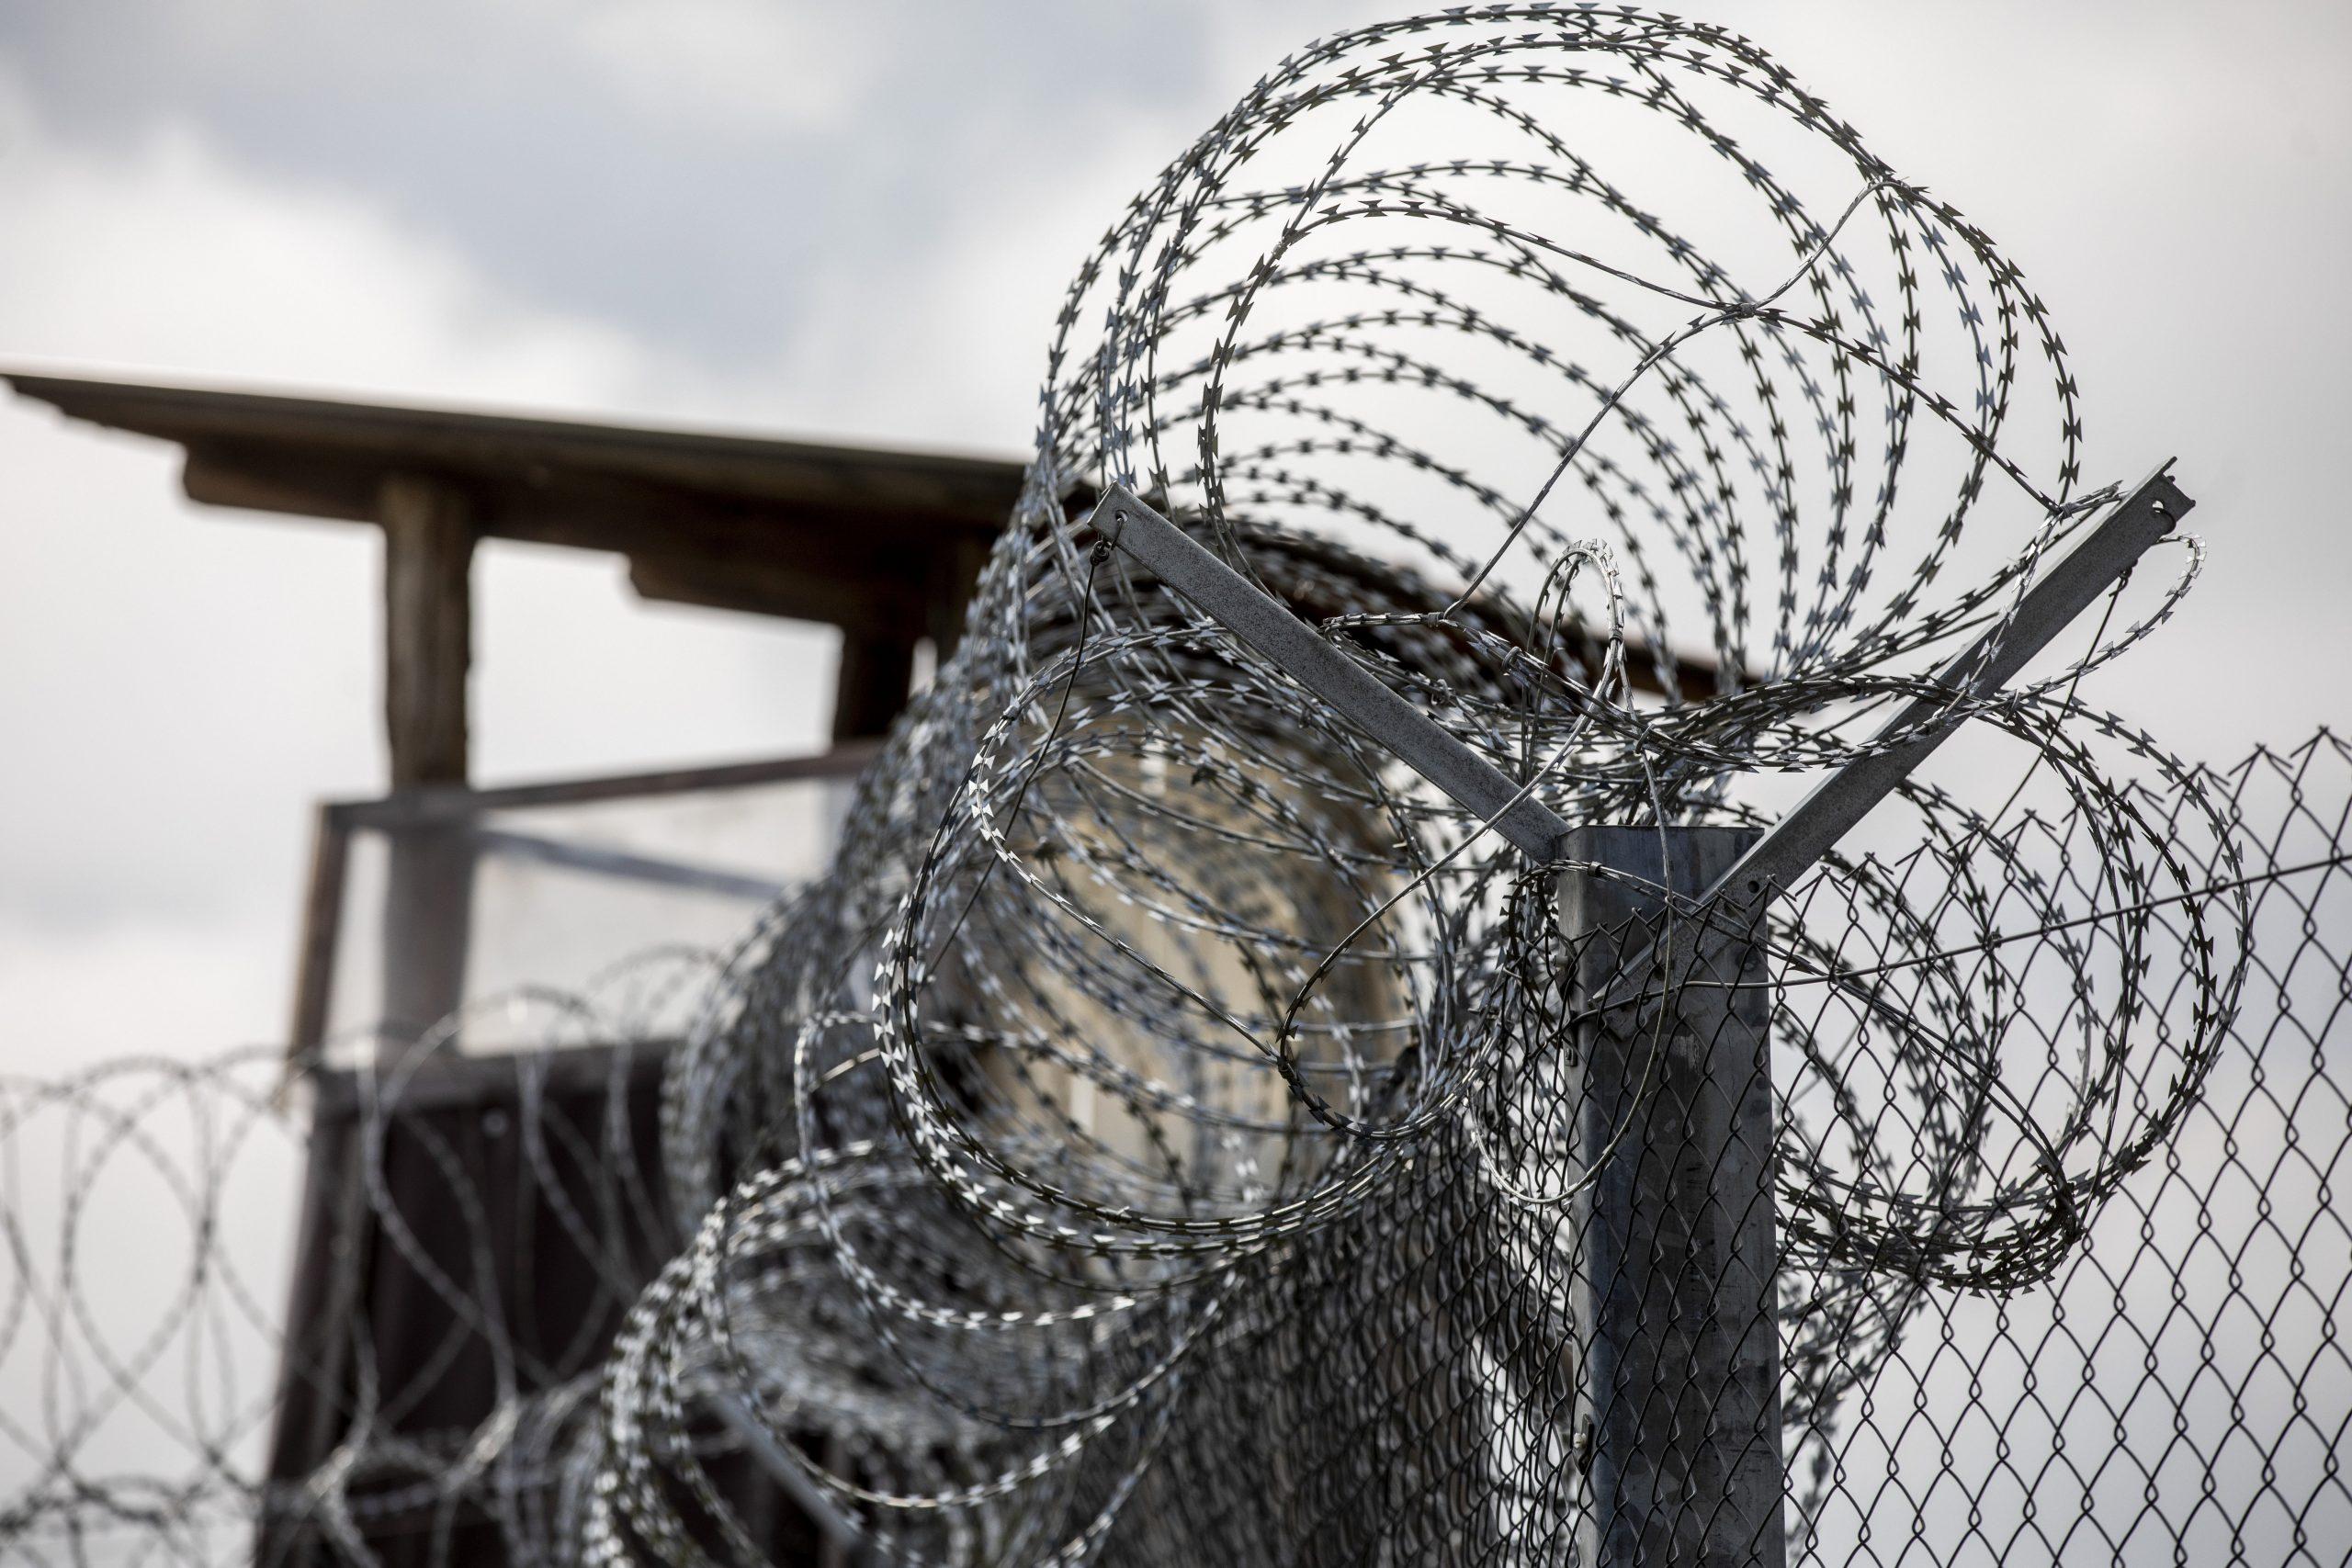 EU Court: Hungary Failing to Fulfil Obligation to Protect Asylum-seekers